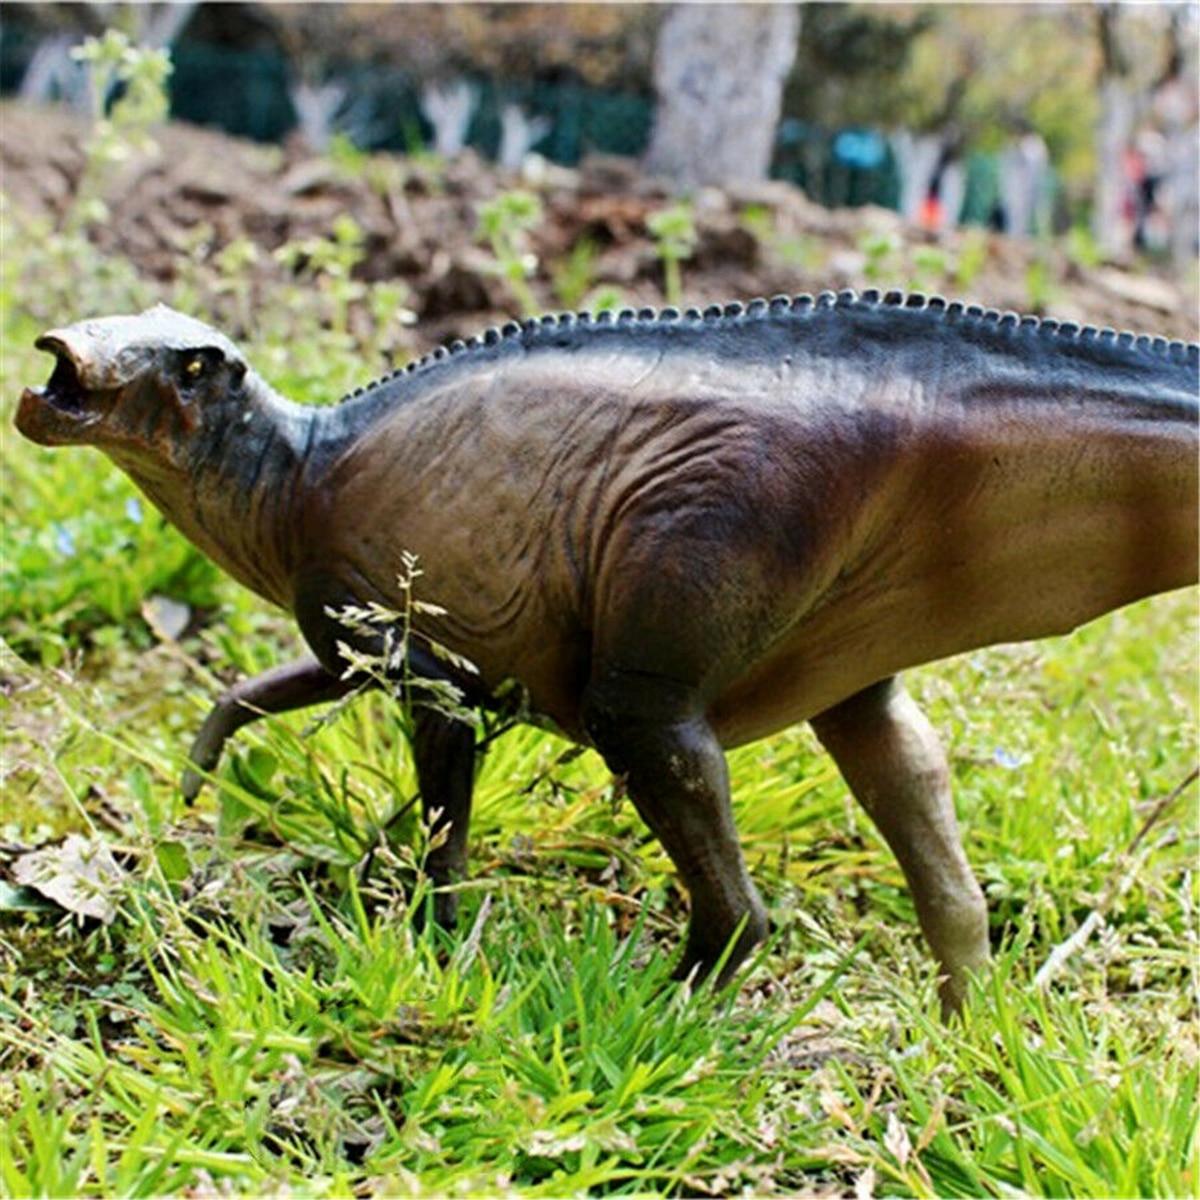 PNSO Shantungosaurus Dinosaur Model Animal Figure Collector Decor Gift Kid Toy